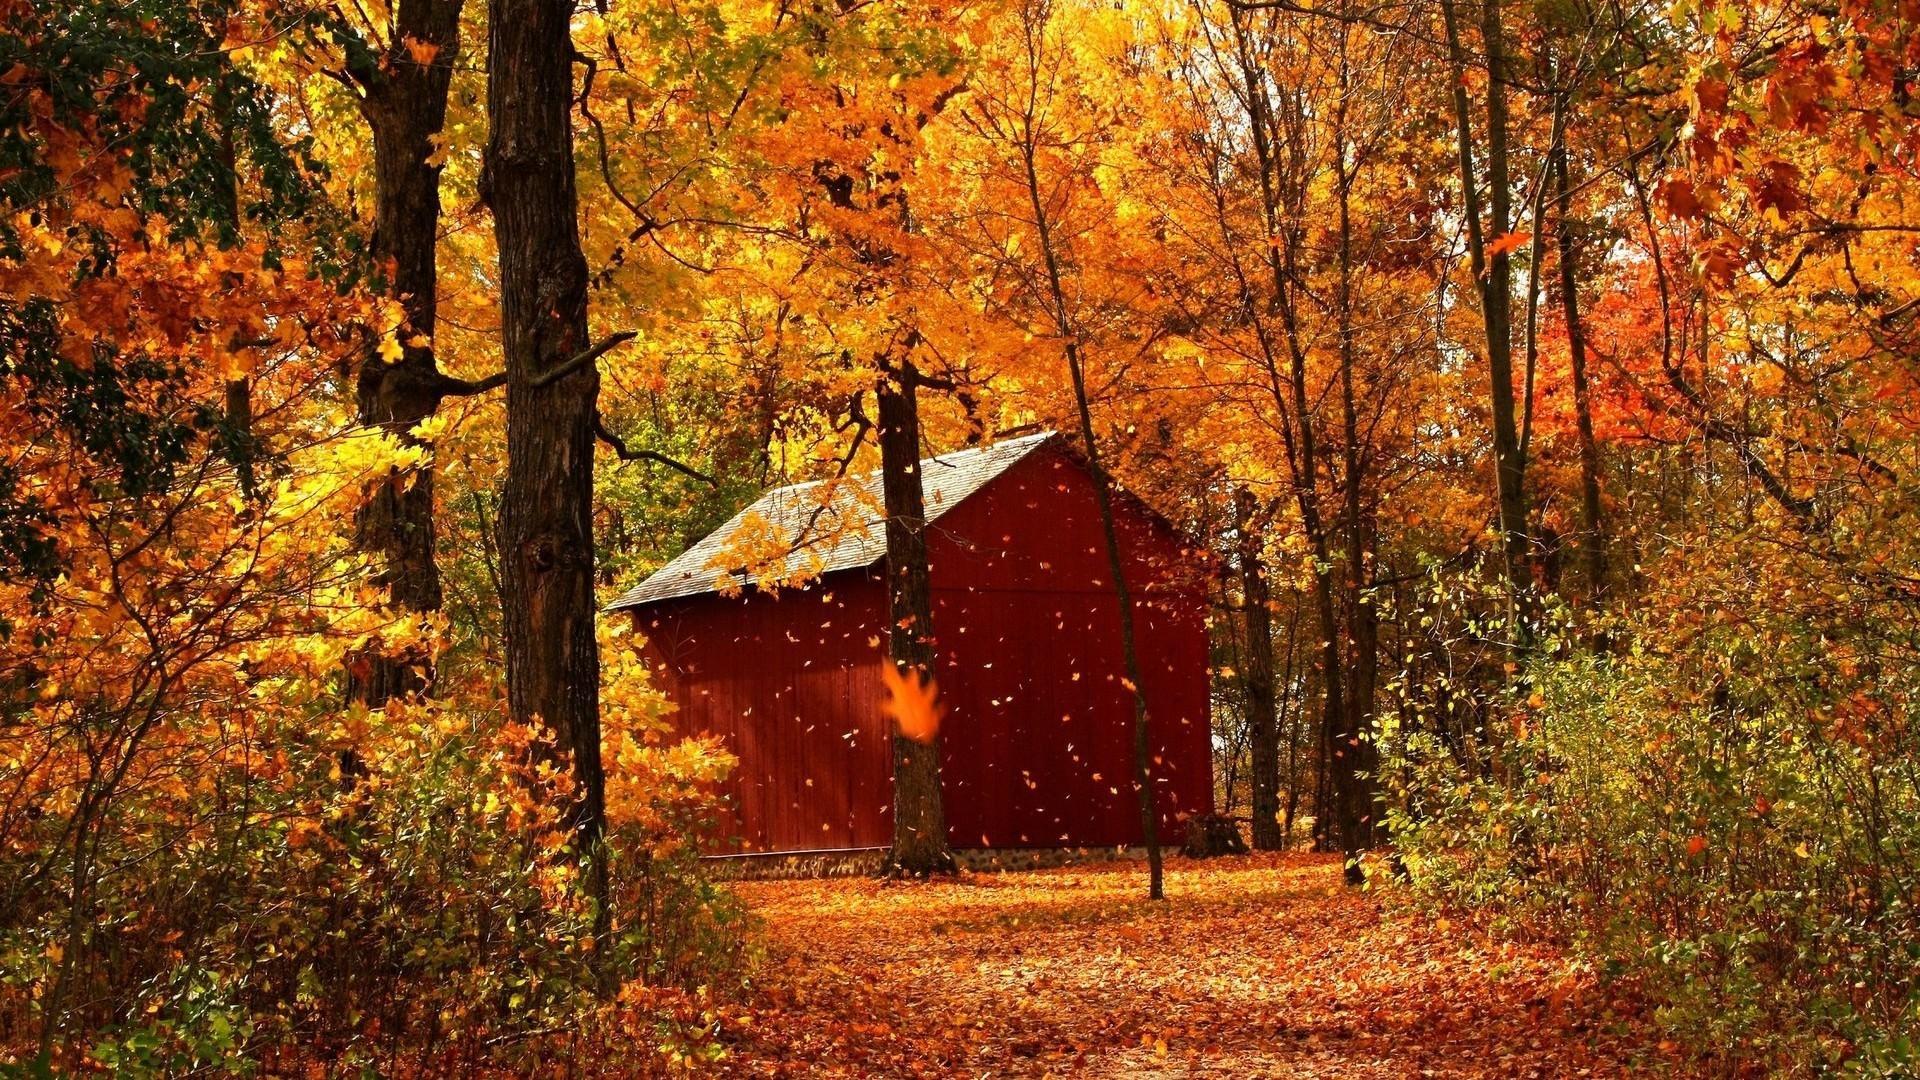 Autumn Breeze Background Image. Autumn Breeze Wallpaper